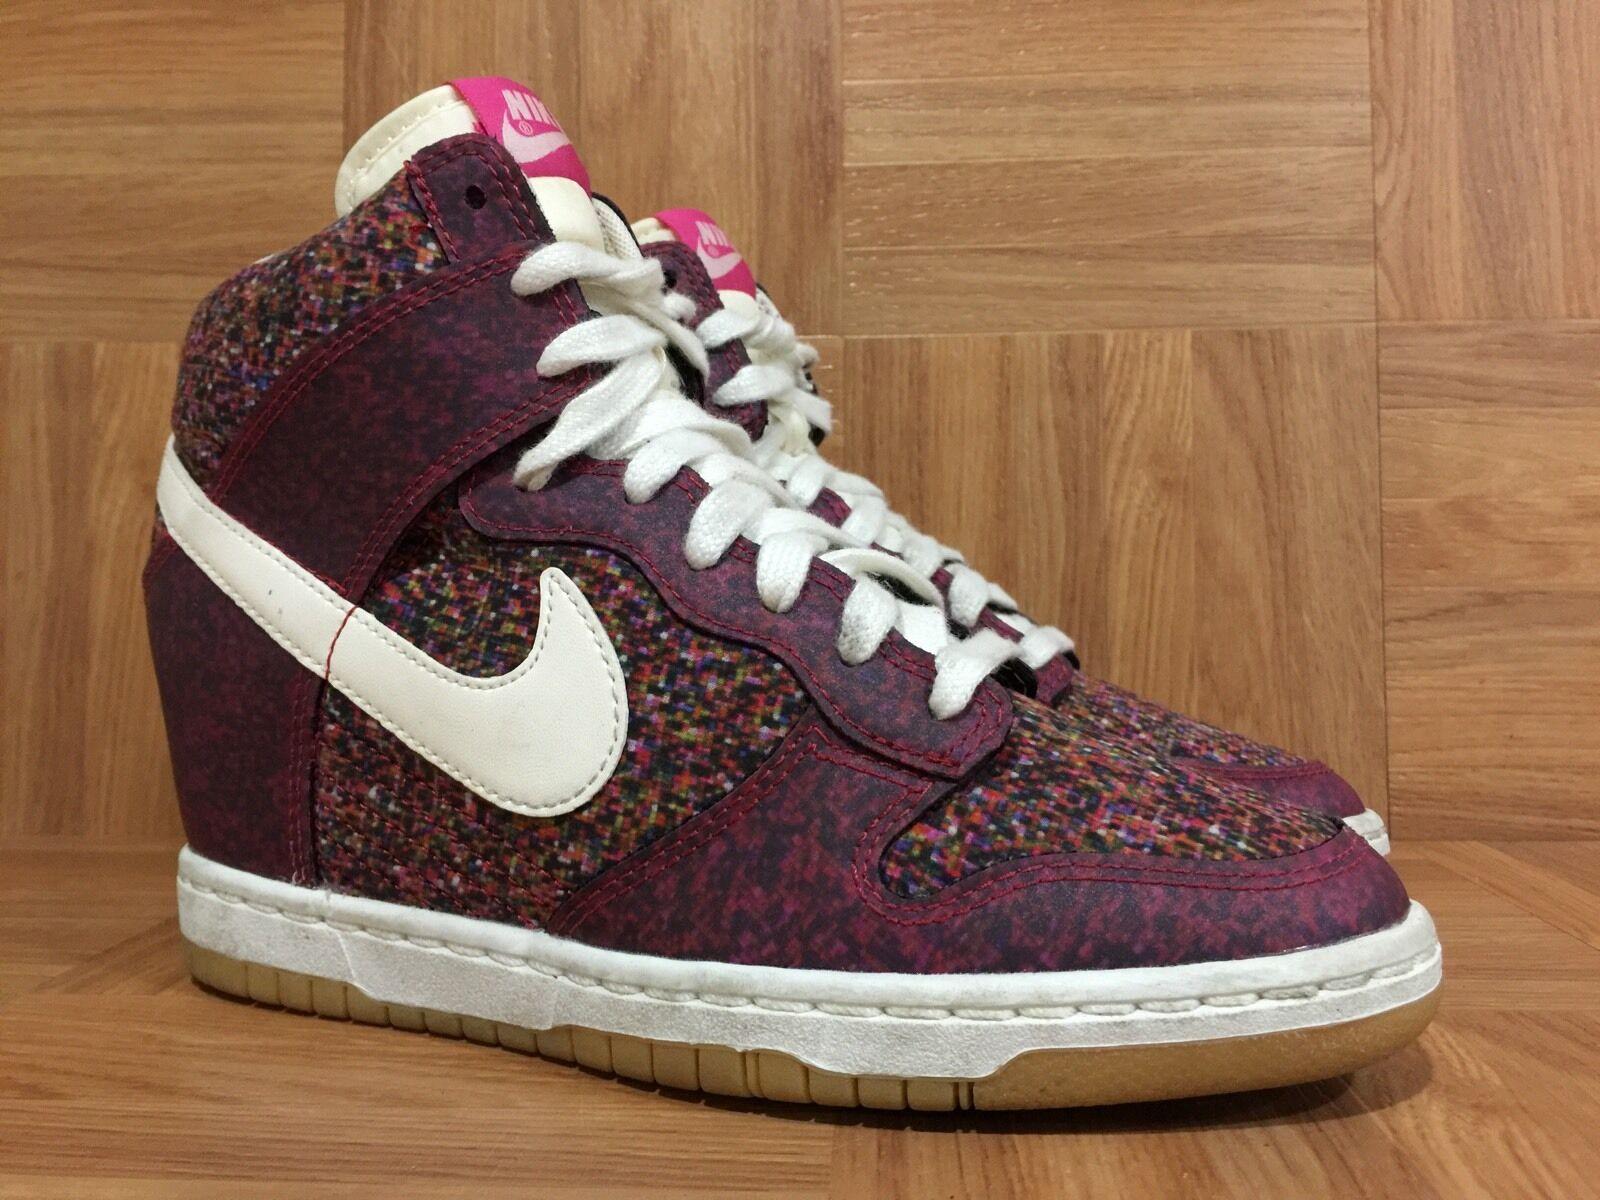 save off 4d583 4519a Nike Dunk Dunk Dunk Sky High Sneaker Wedge Liberty Digital Floral Pink 6  540859